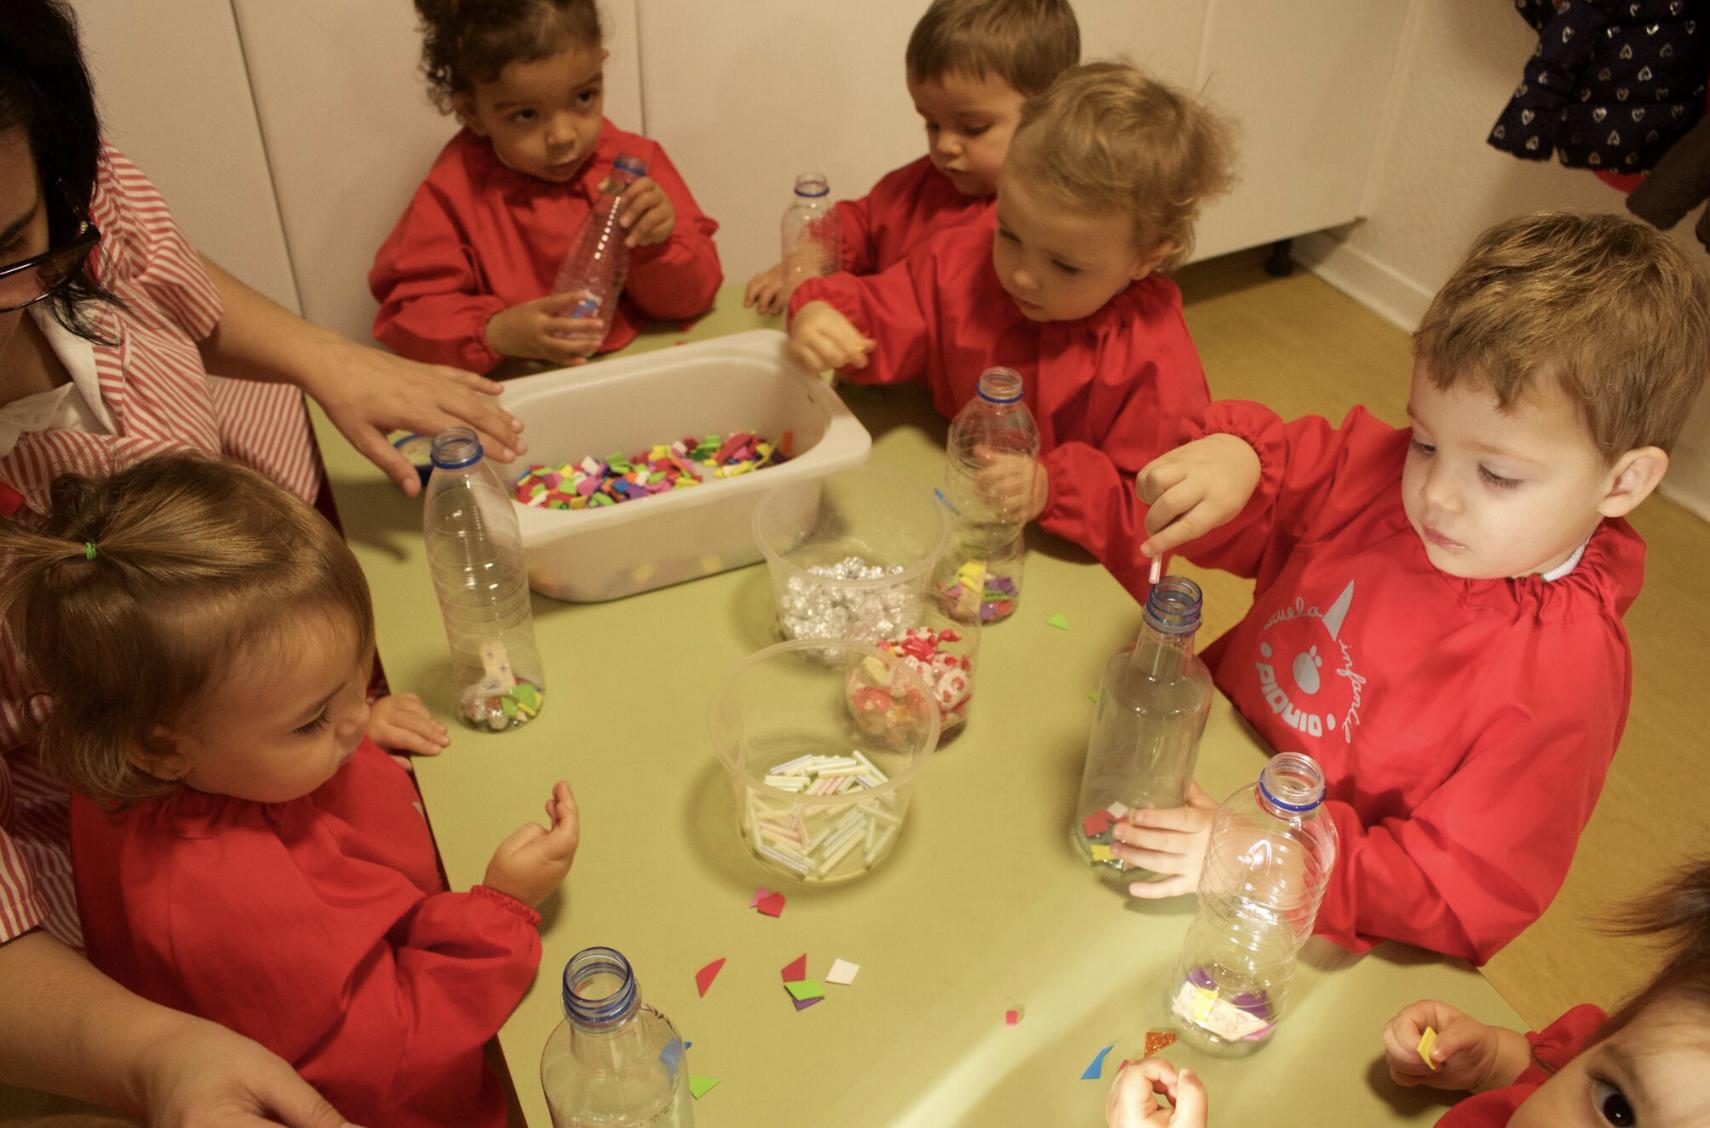 La mejor Escuela Infantil en Pozuelo